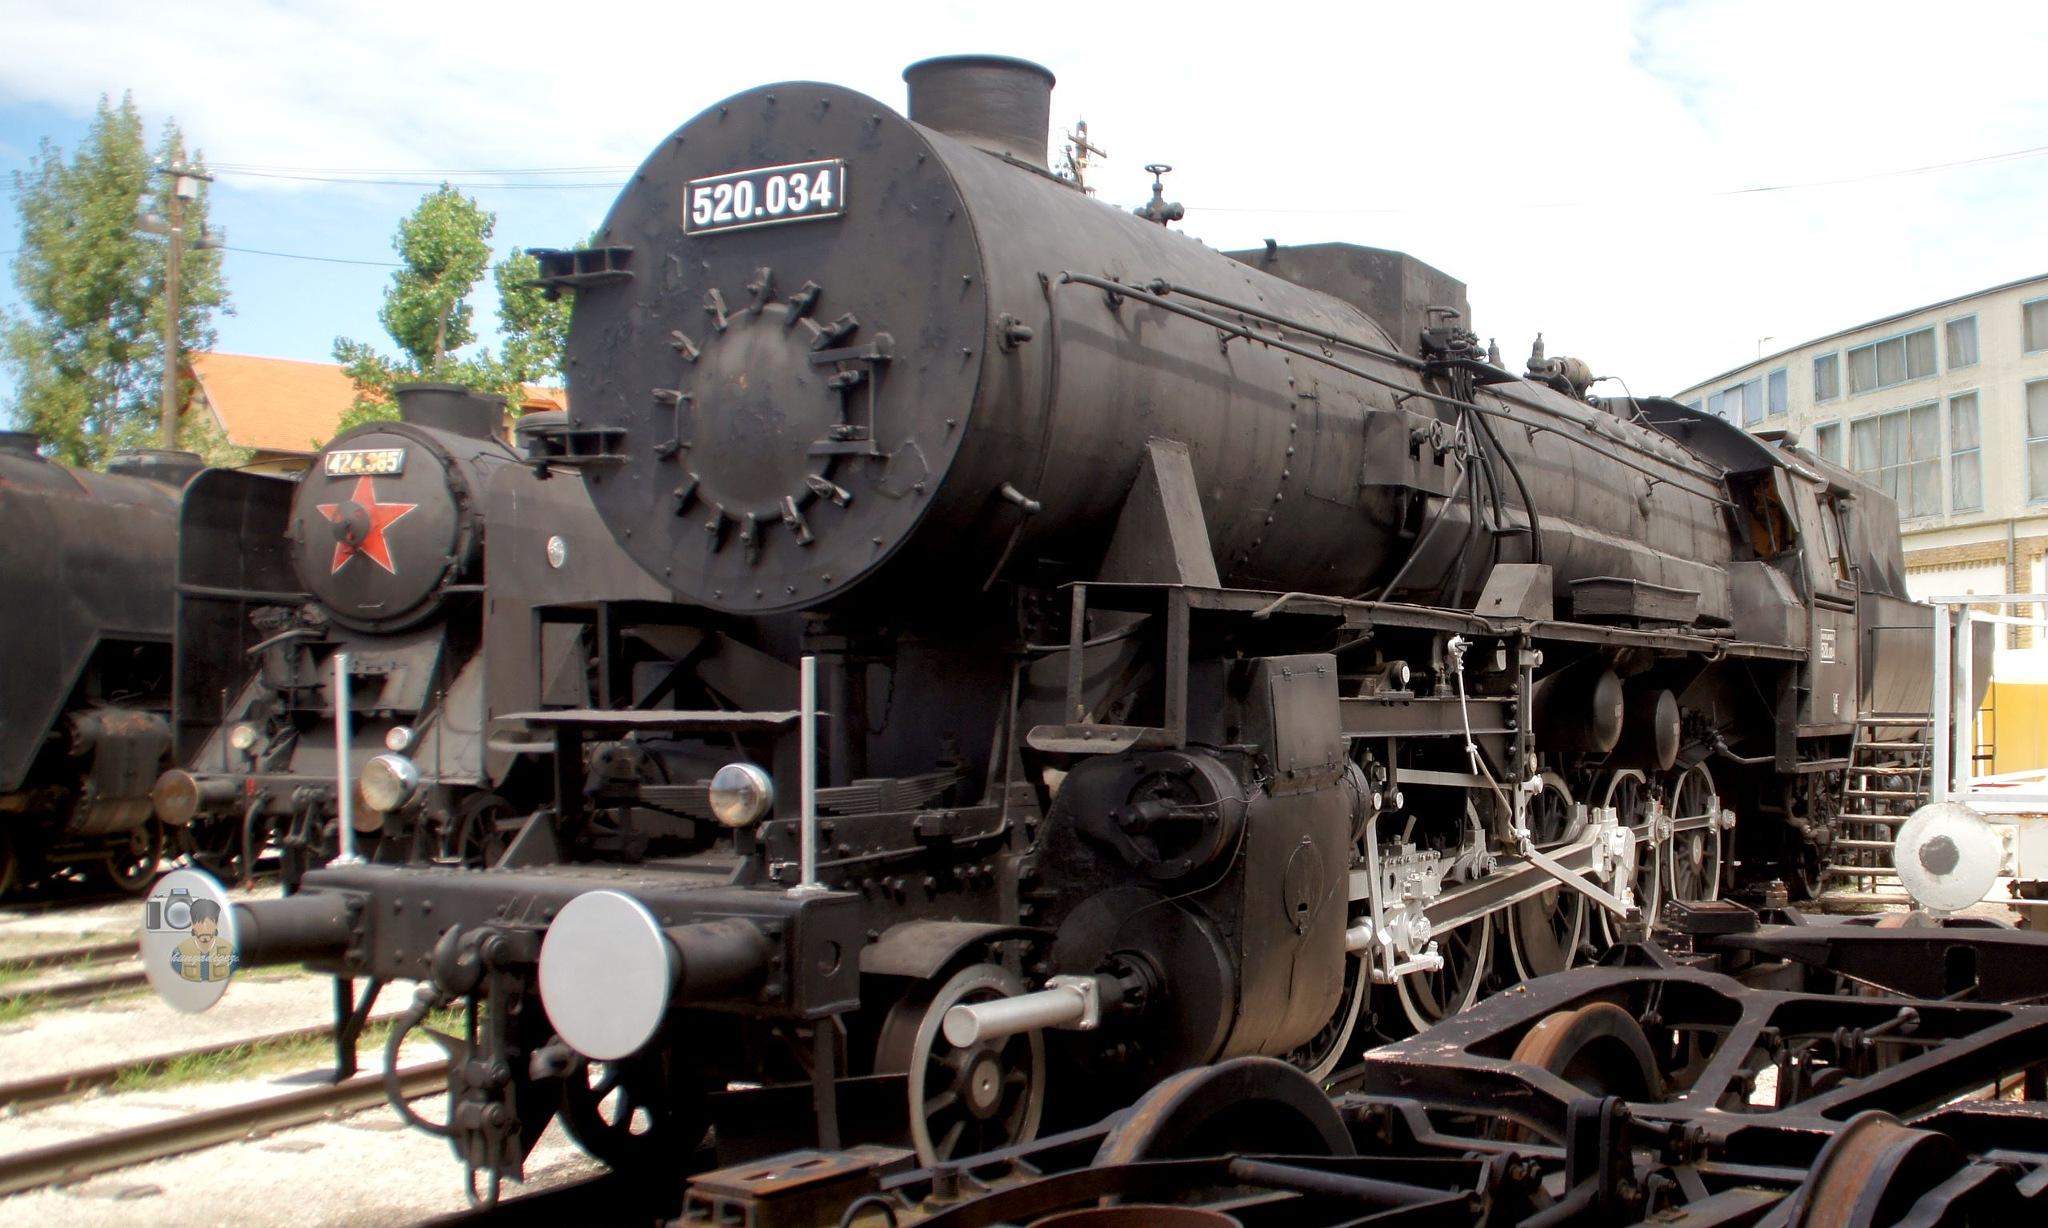 July 31, 2015. Hungarian Railway History Park Budapest, Hungary by hunyadigeza